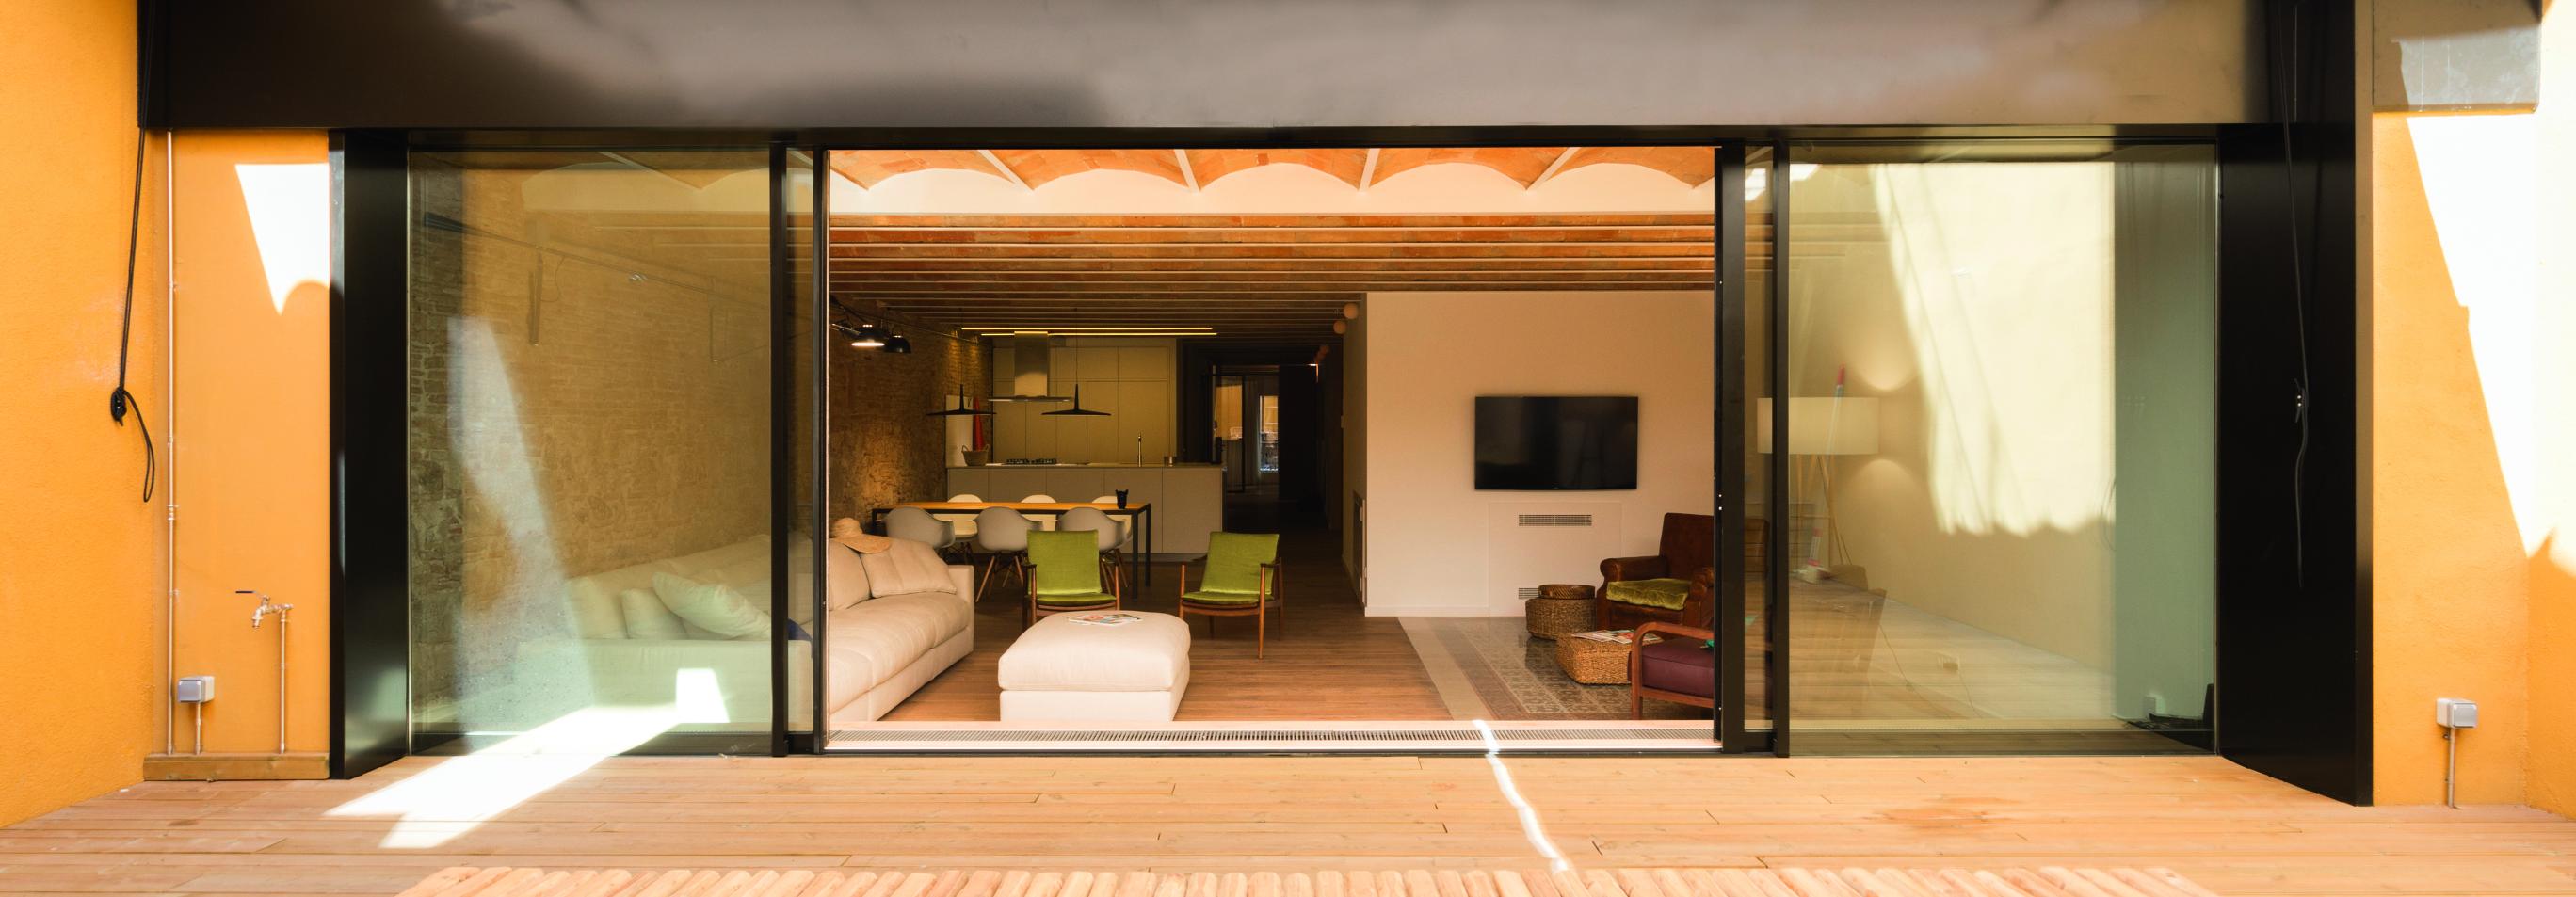 Le coulissant minimal lumeal technal fr - Cabinet vinci immobilier ...